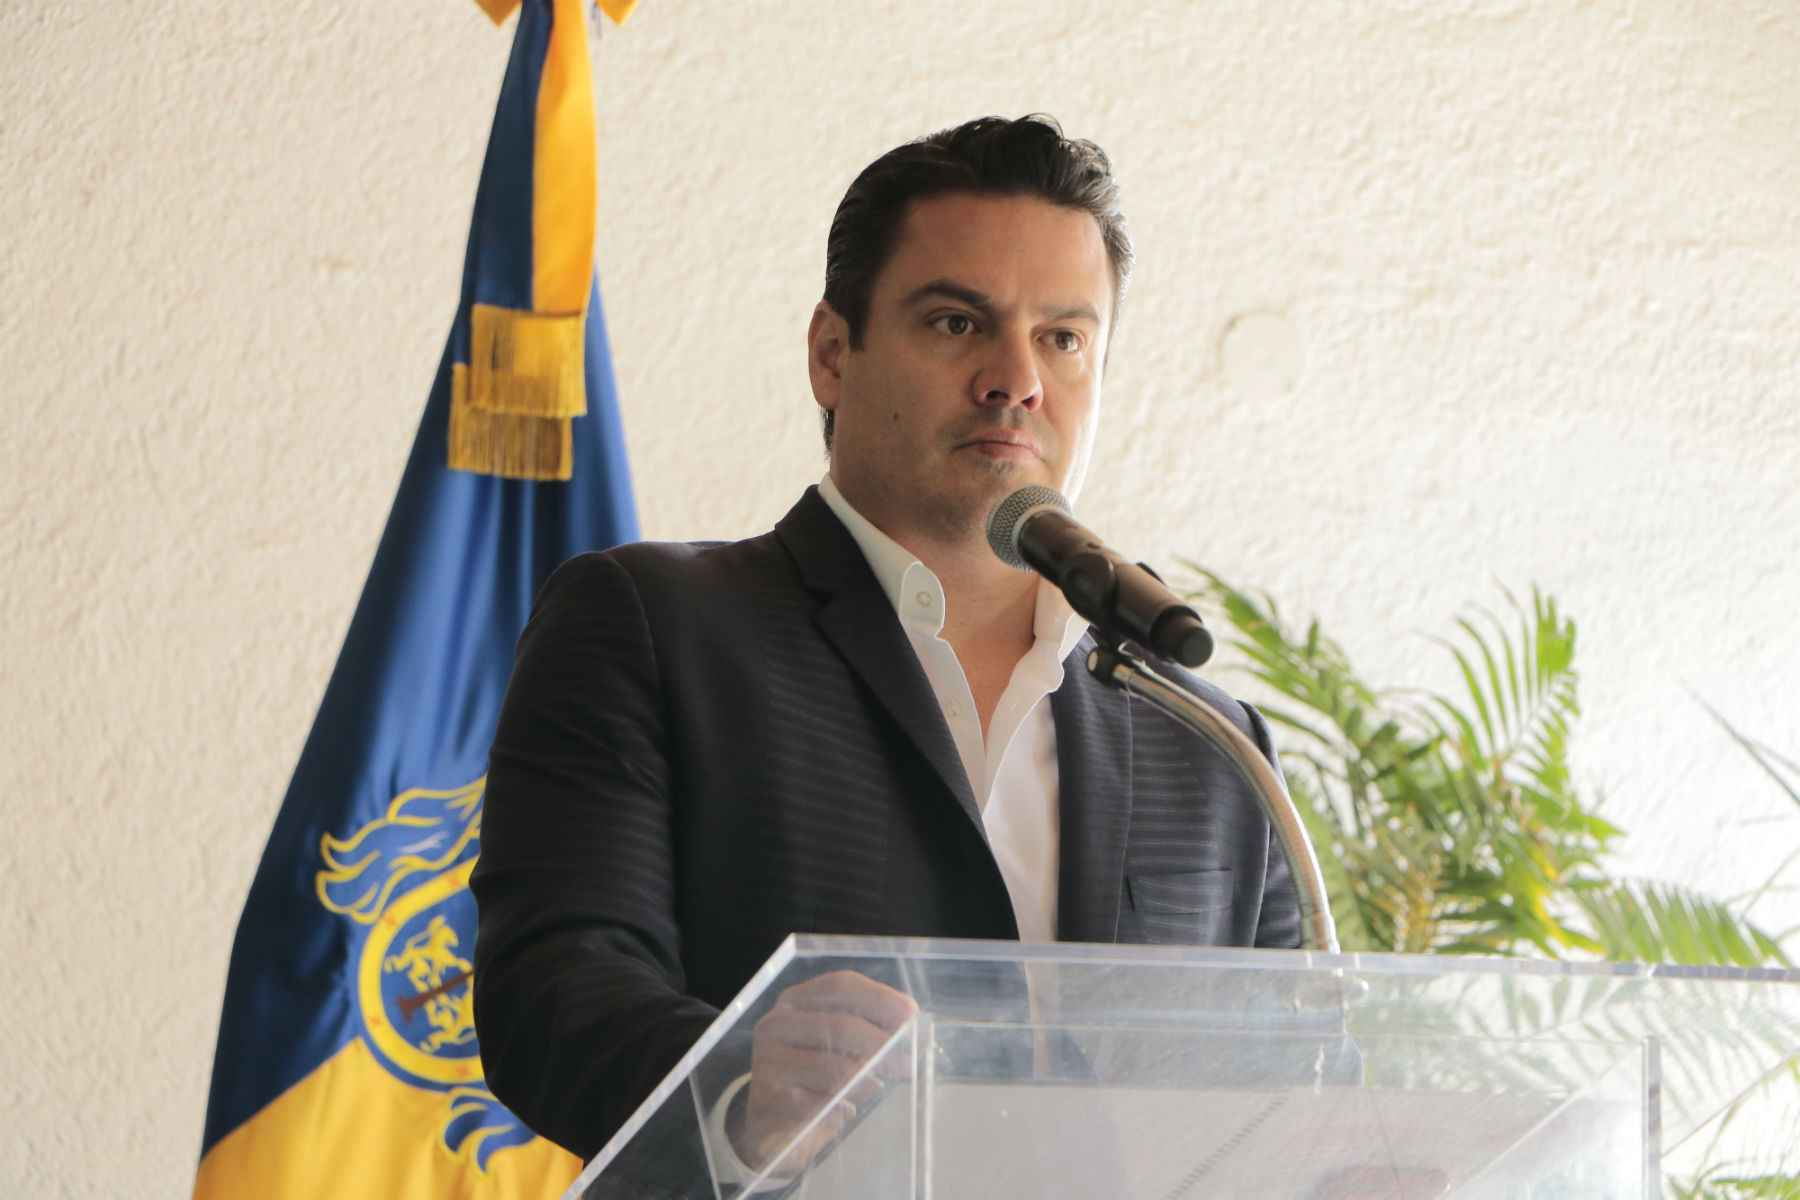 Llega inversión por 100 mdd a Lagos de Moreno